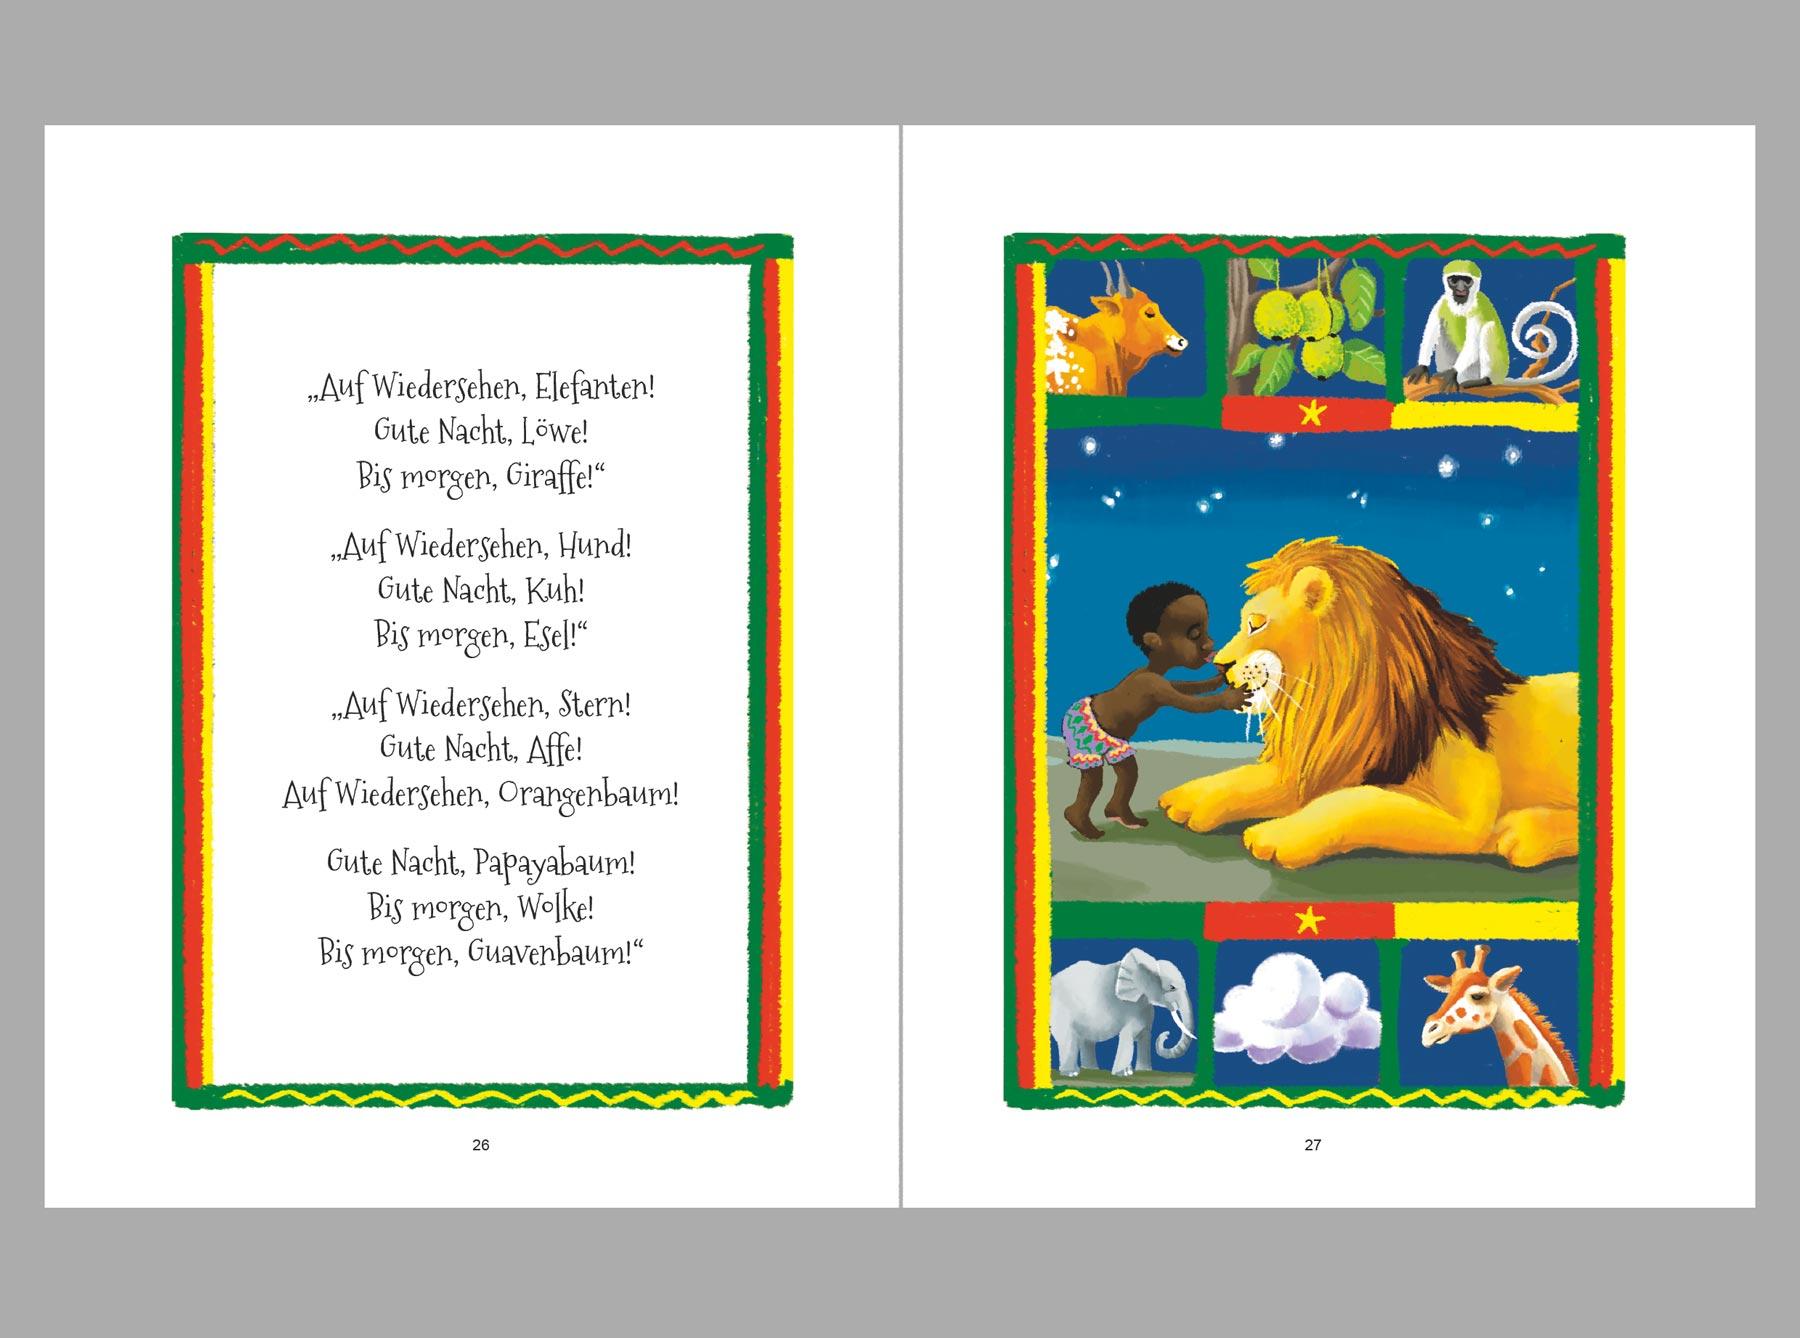 Afrikanisches Gute Nacht Buch Daniela Henninger